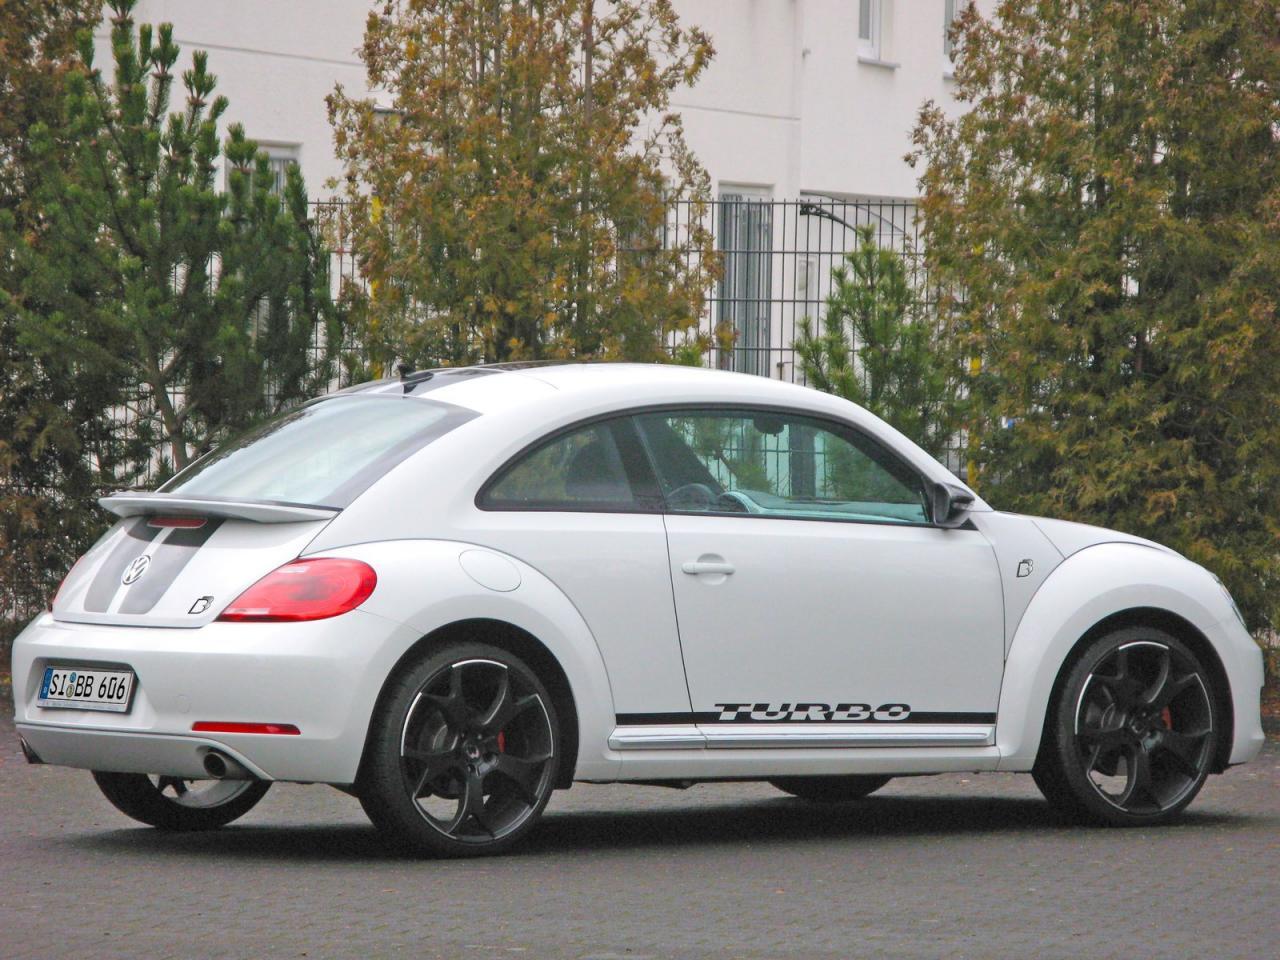 2012 volkswagen beetle by b b delivers 320 hp autoevolution. Black Bedroom Furniture Sets. Home Design Ideas